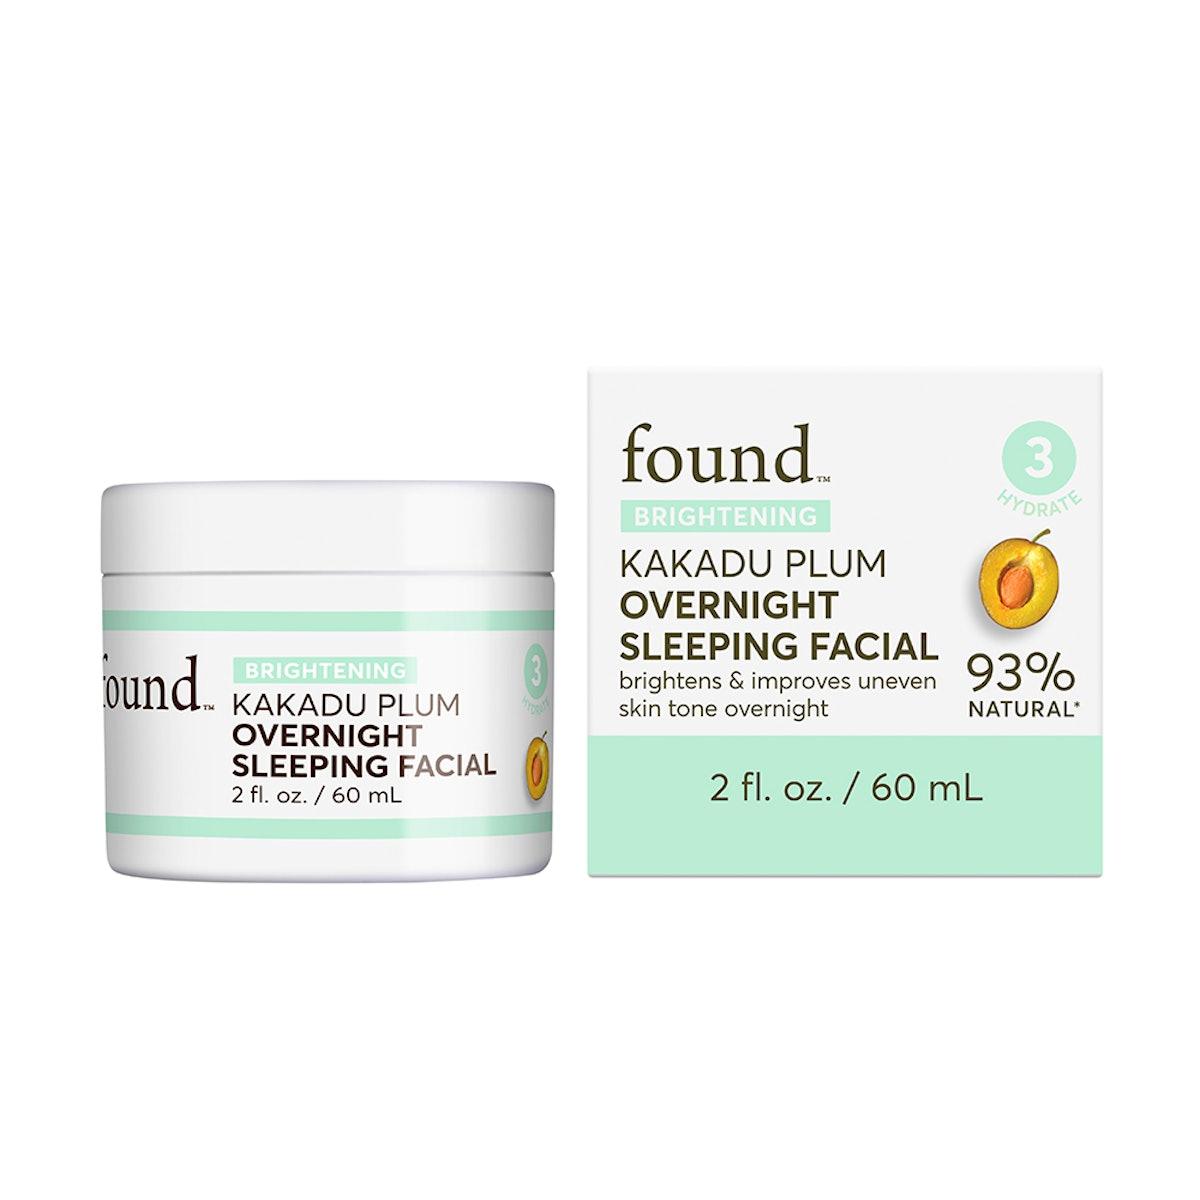 FOUND BRIGHTENING Kakadu Plum Overnight Sleeping Facial, 2 fl oz